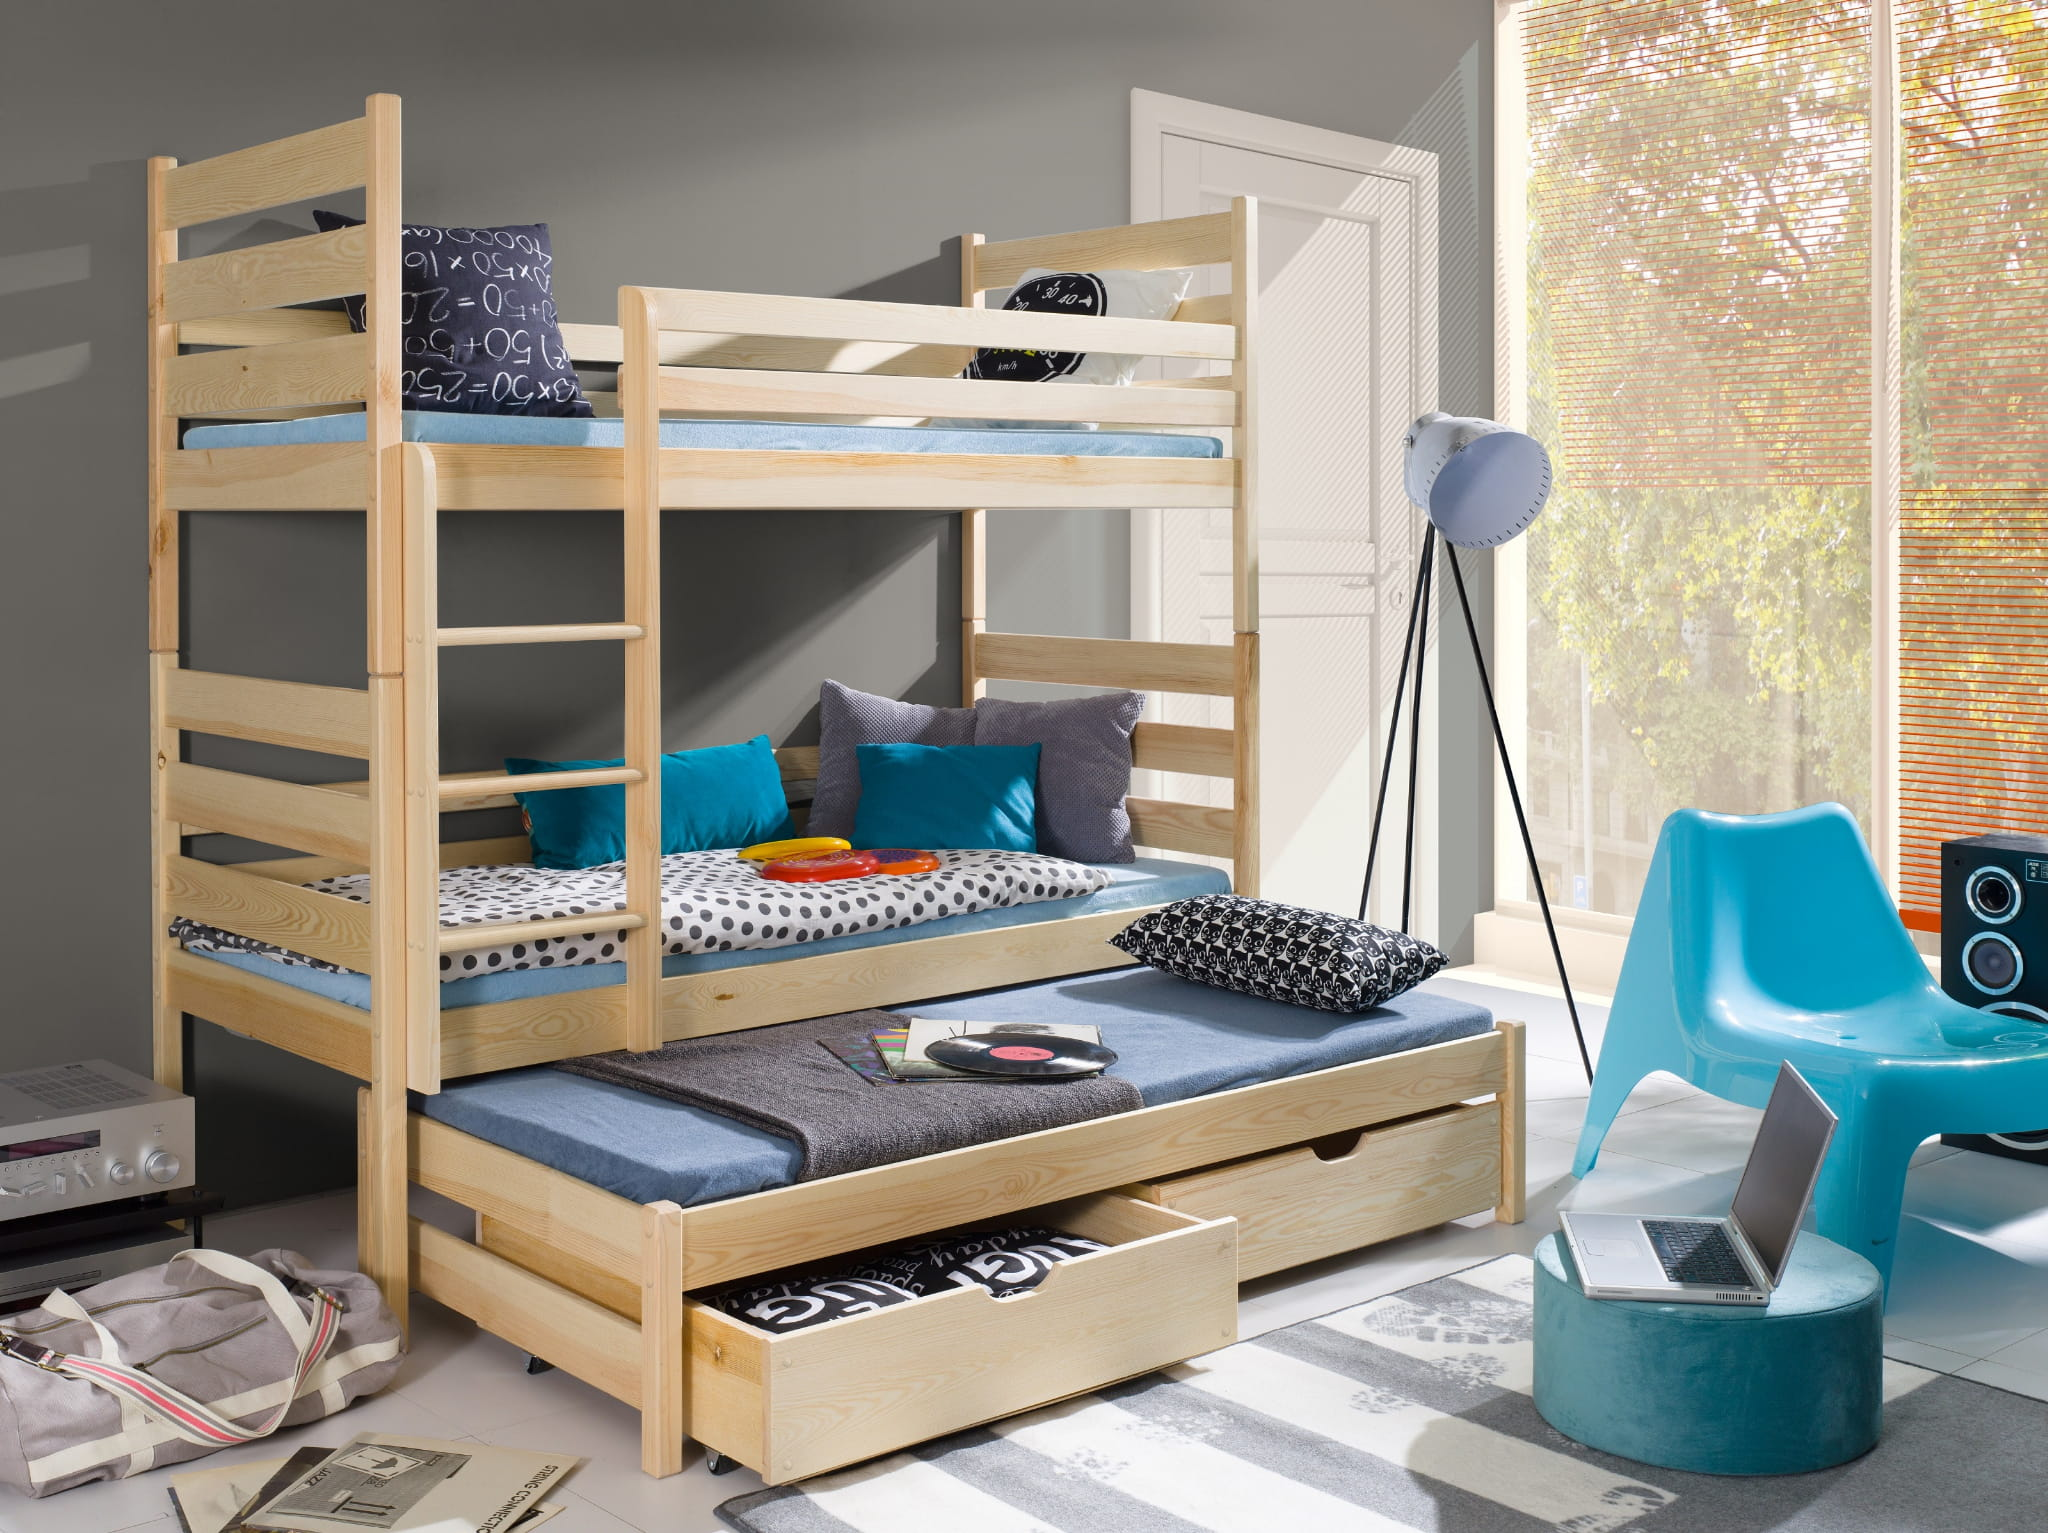 etagenbett tomi etagenbett kinder etagenbett f r 3. Black Bedroom Furniture Sets. Home Design Ideas